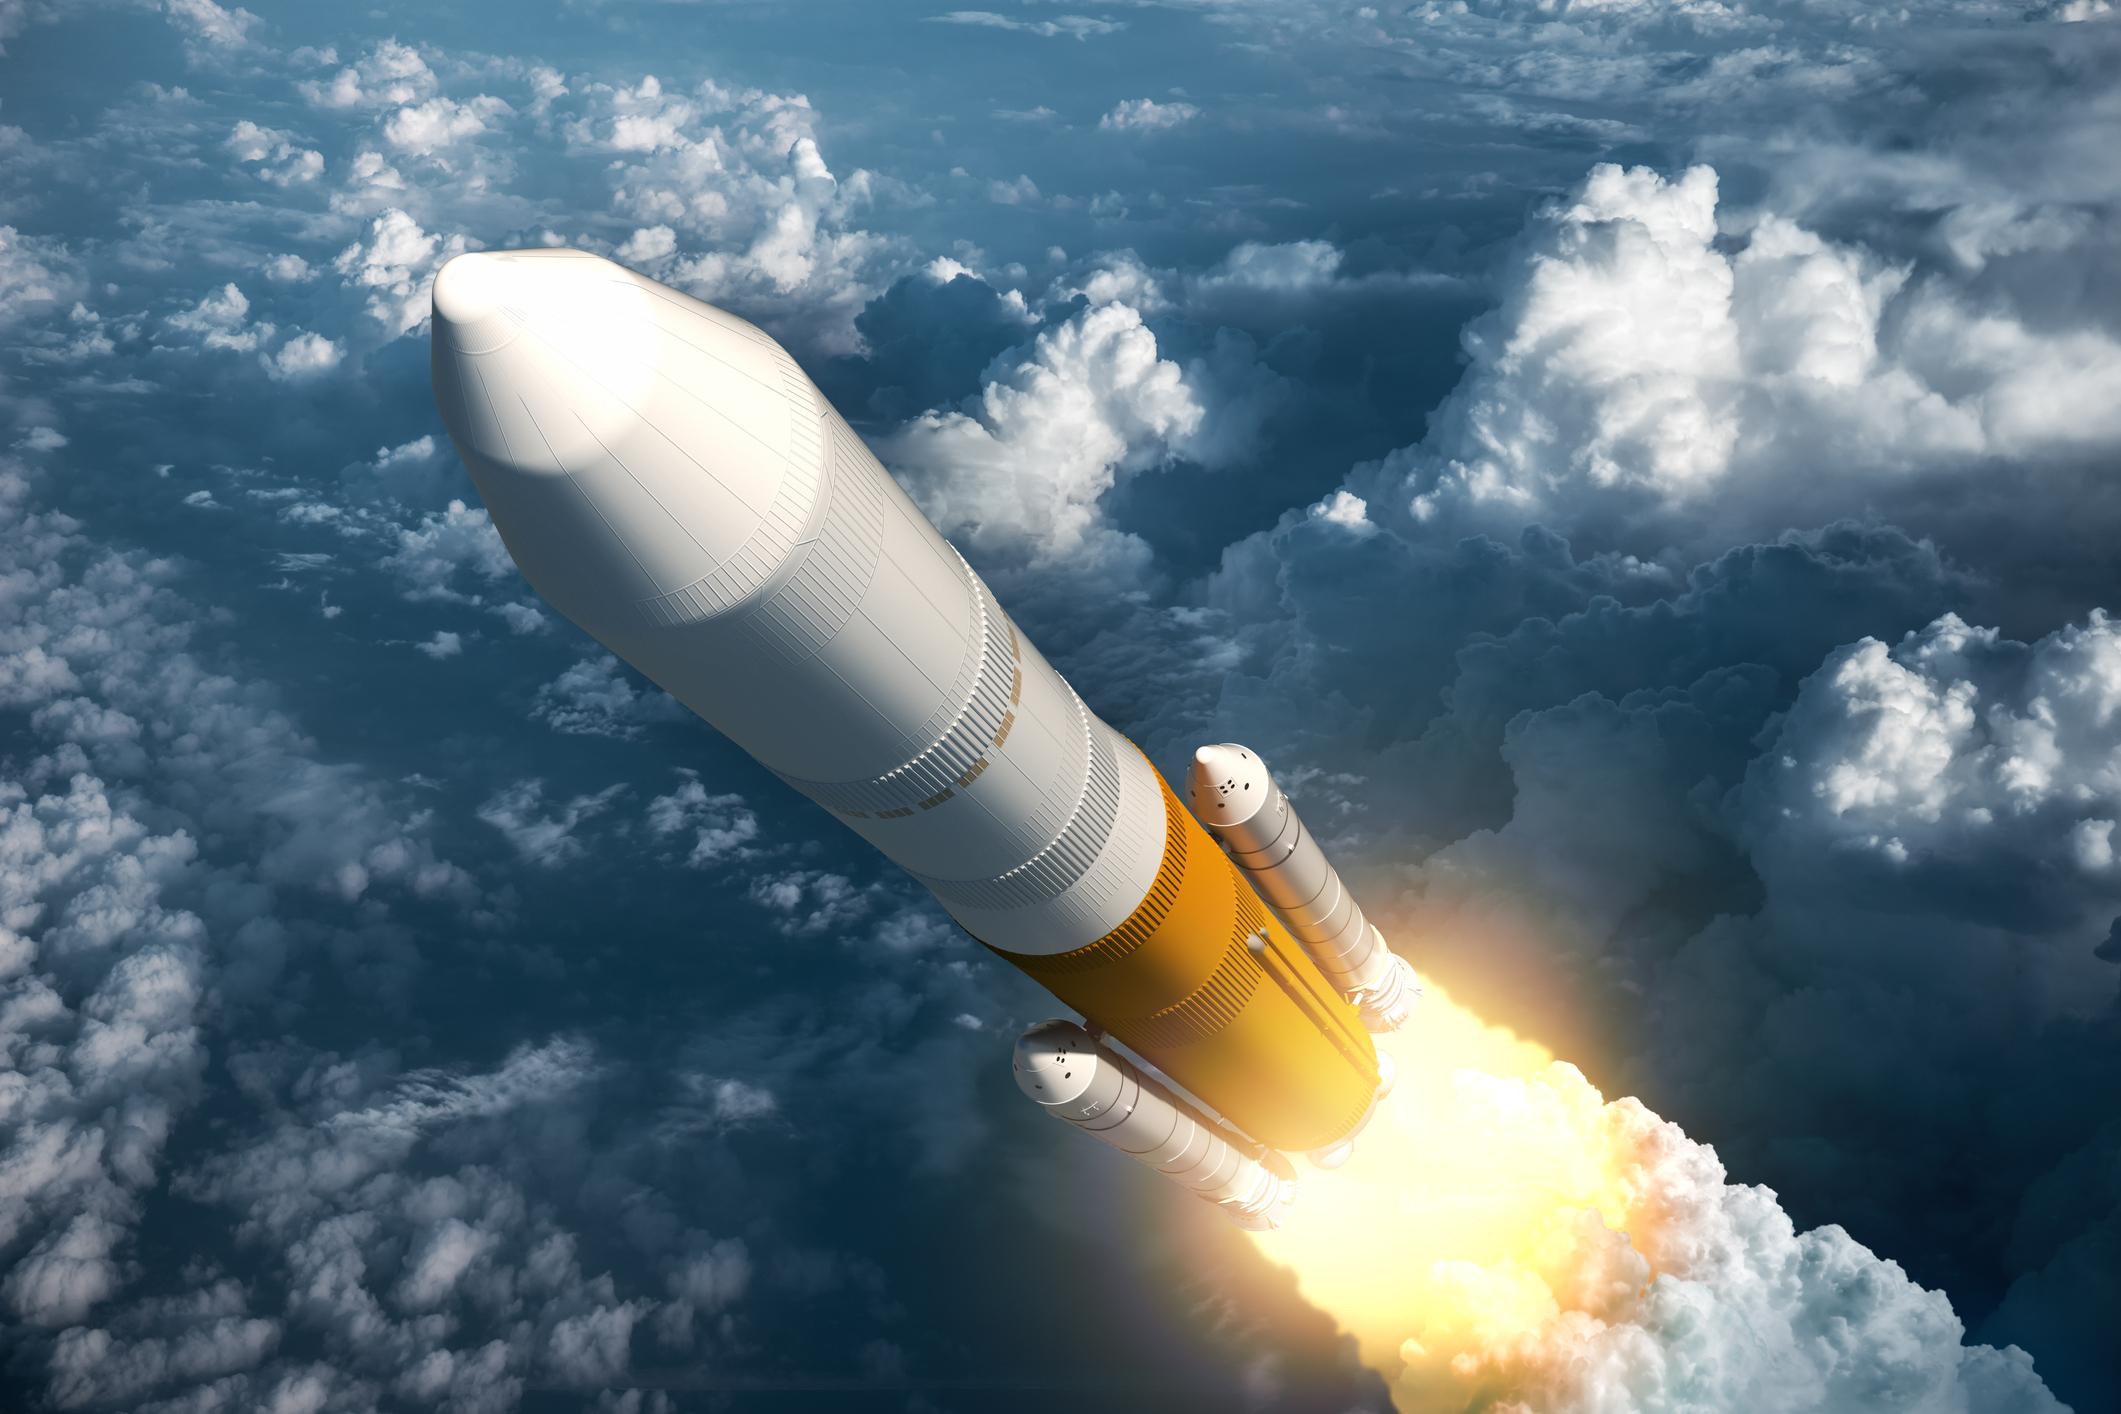 A rocket ascending above clouds